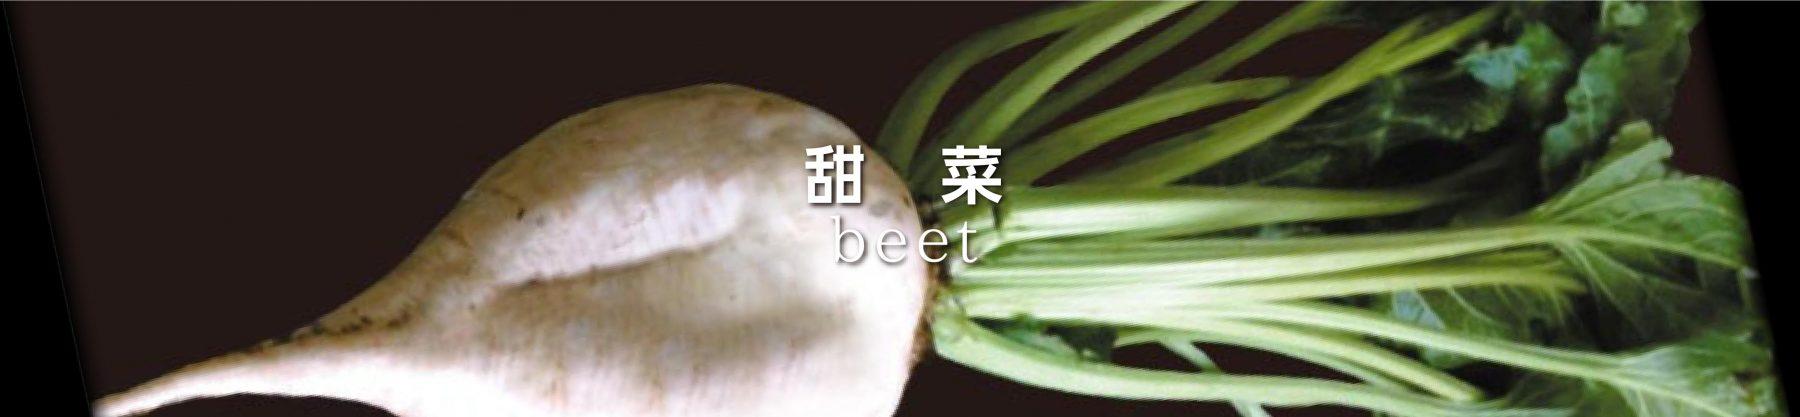 beet5